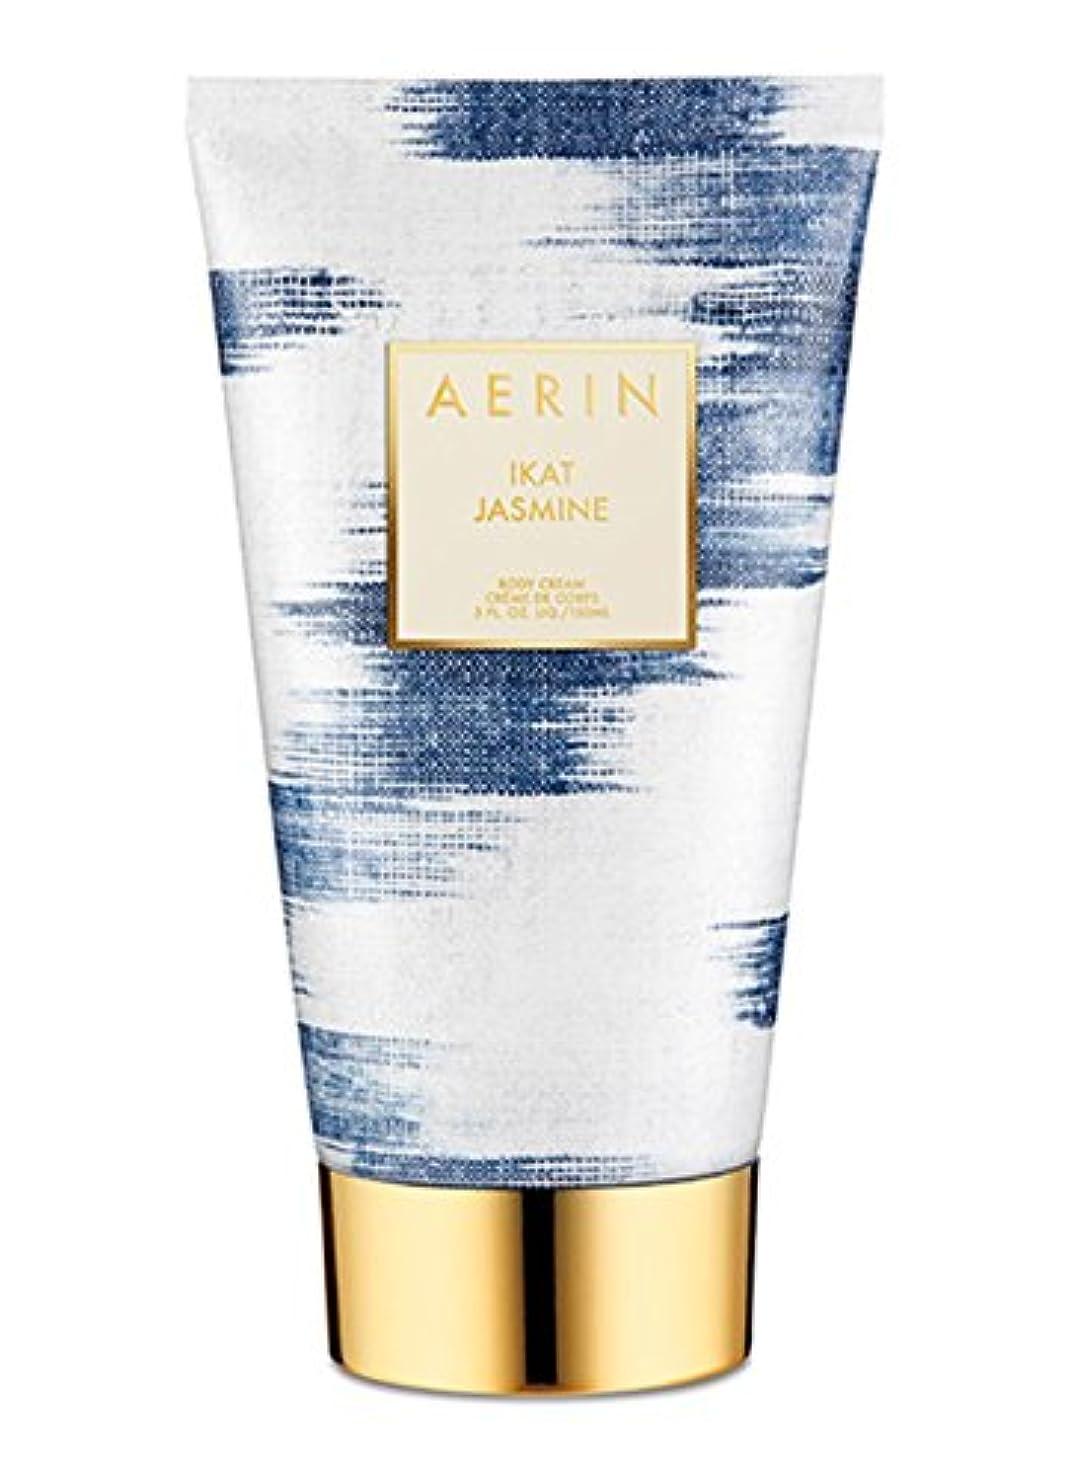 AERIN 'Ikat Jasmine' (アエリン イカ ジャスミン) 5.0 oz (150ml) Body Cream by Estee Lauder for Women